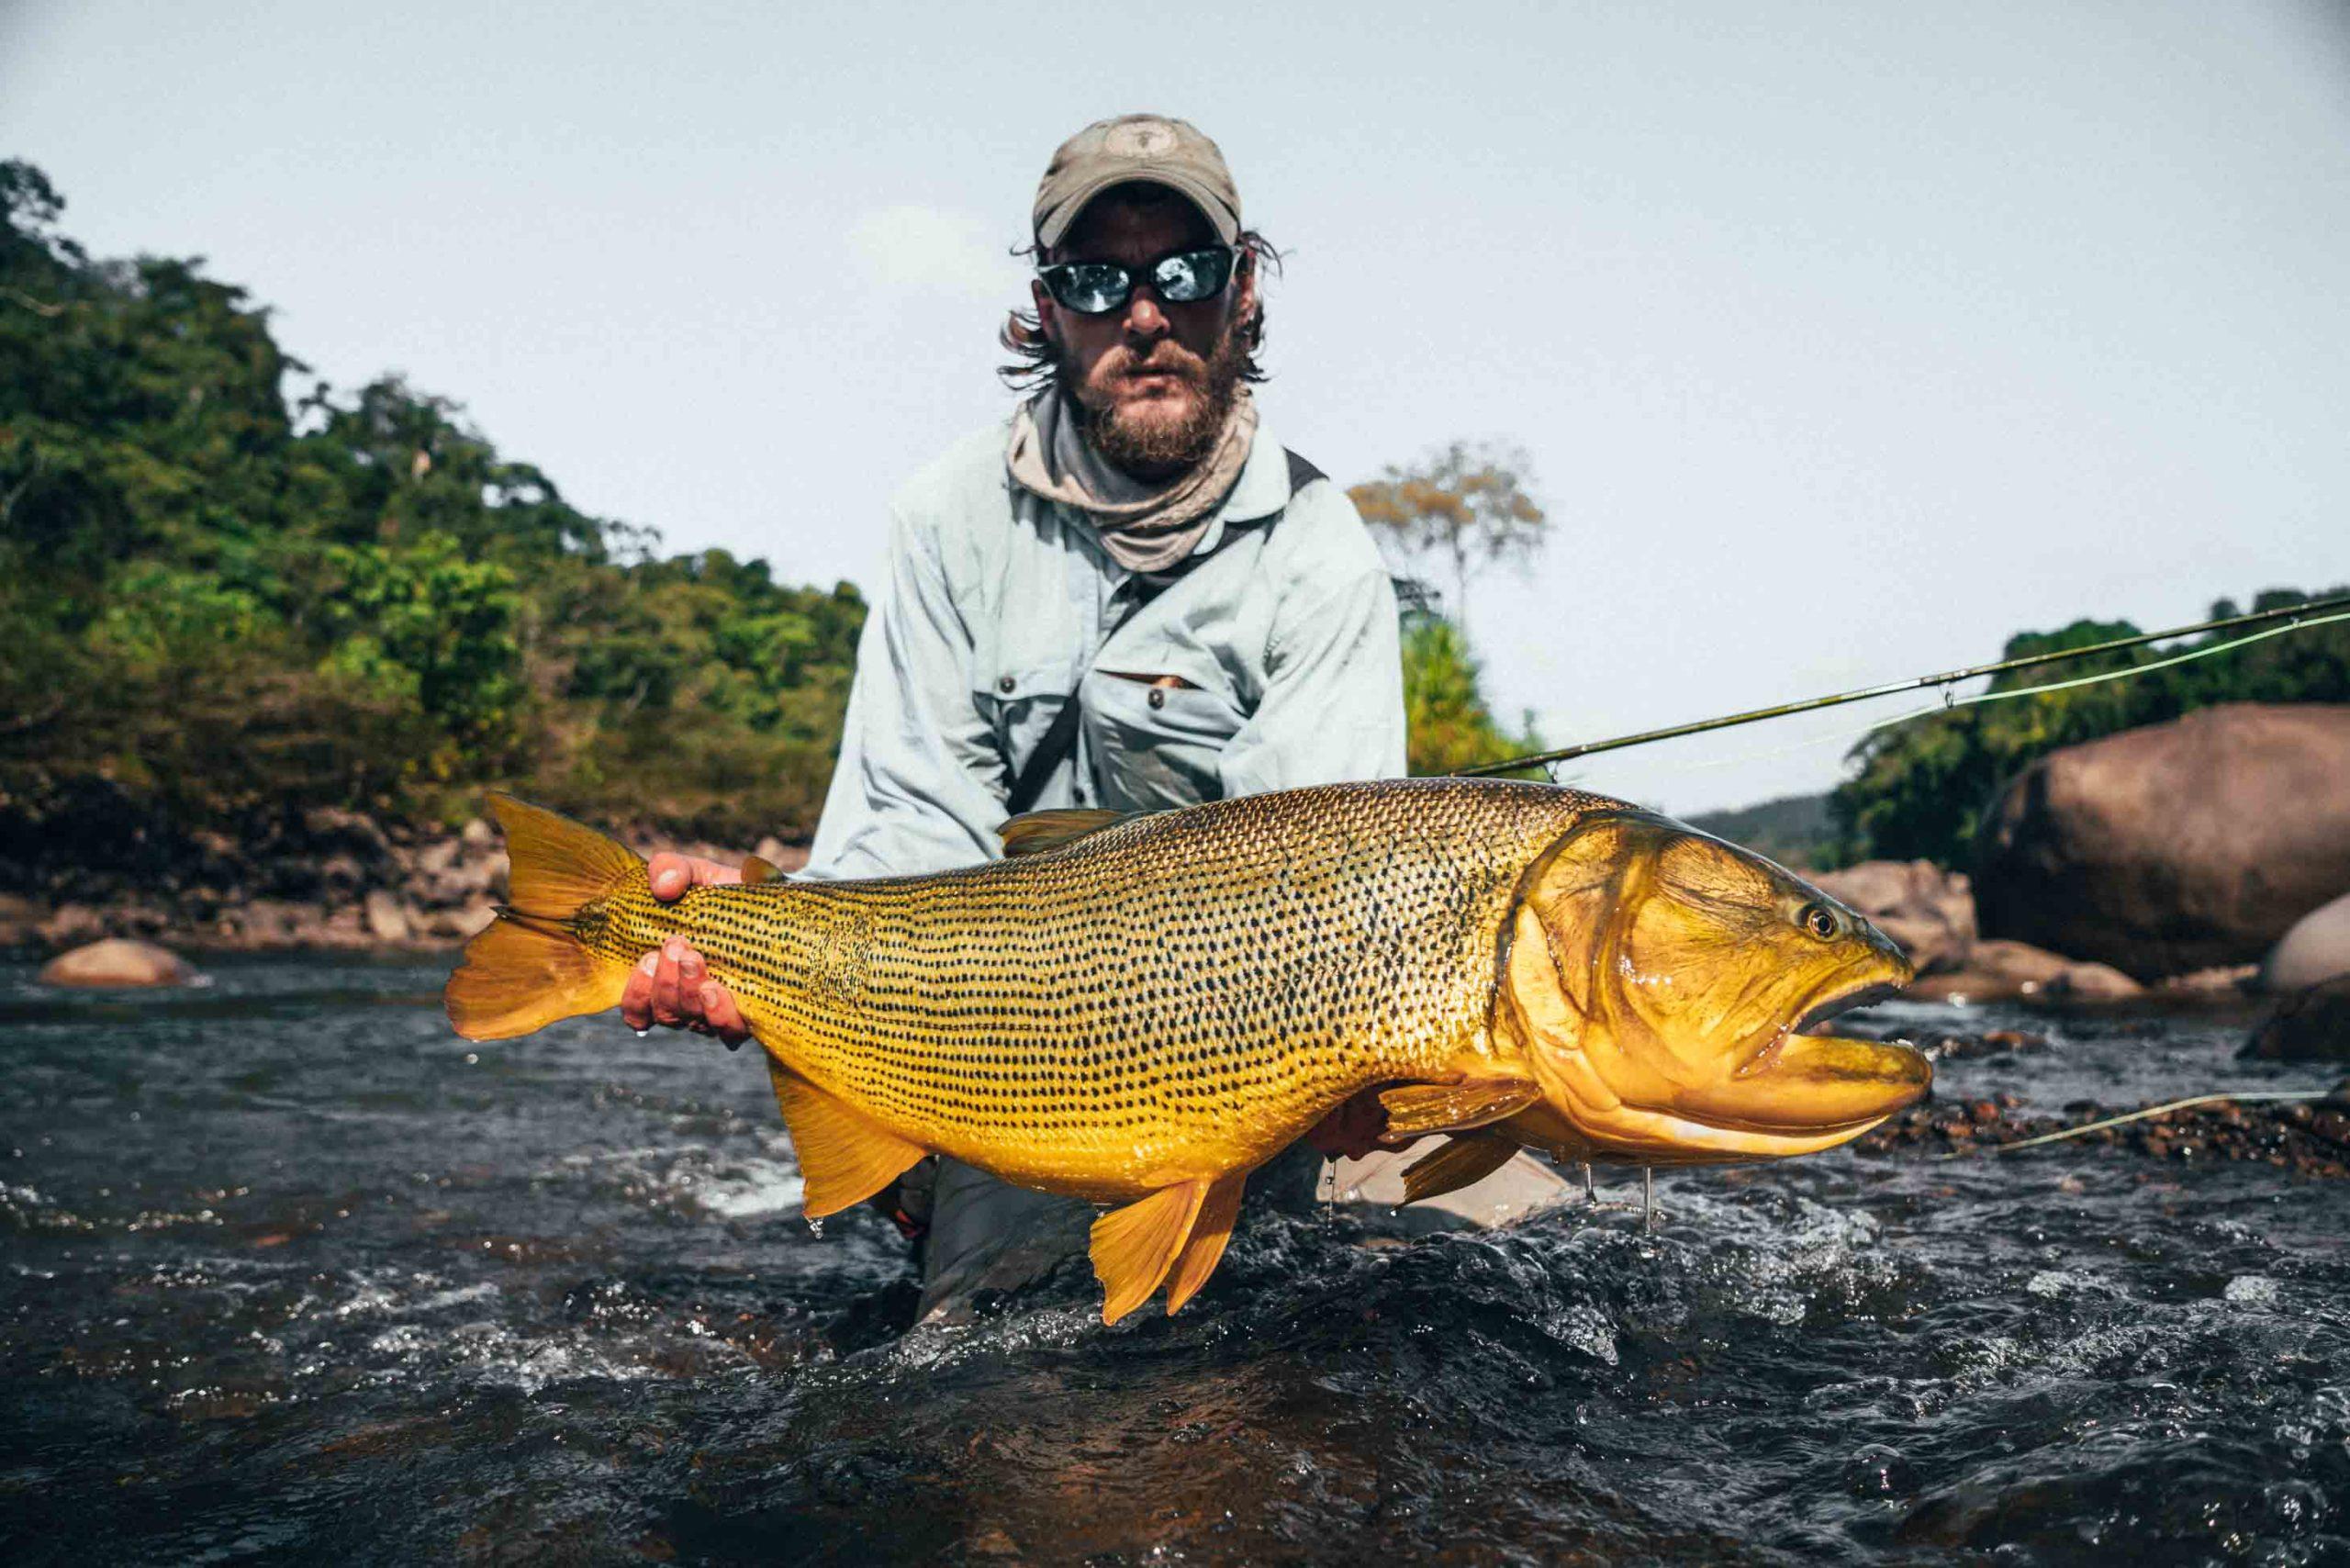 yuracare lodge, tsimane, bolivia, untamed angling, jungle fishing, golden dorado, pacu, aardvark mcleod